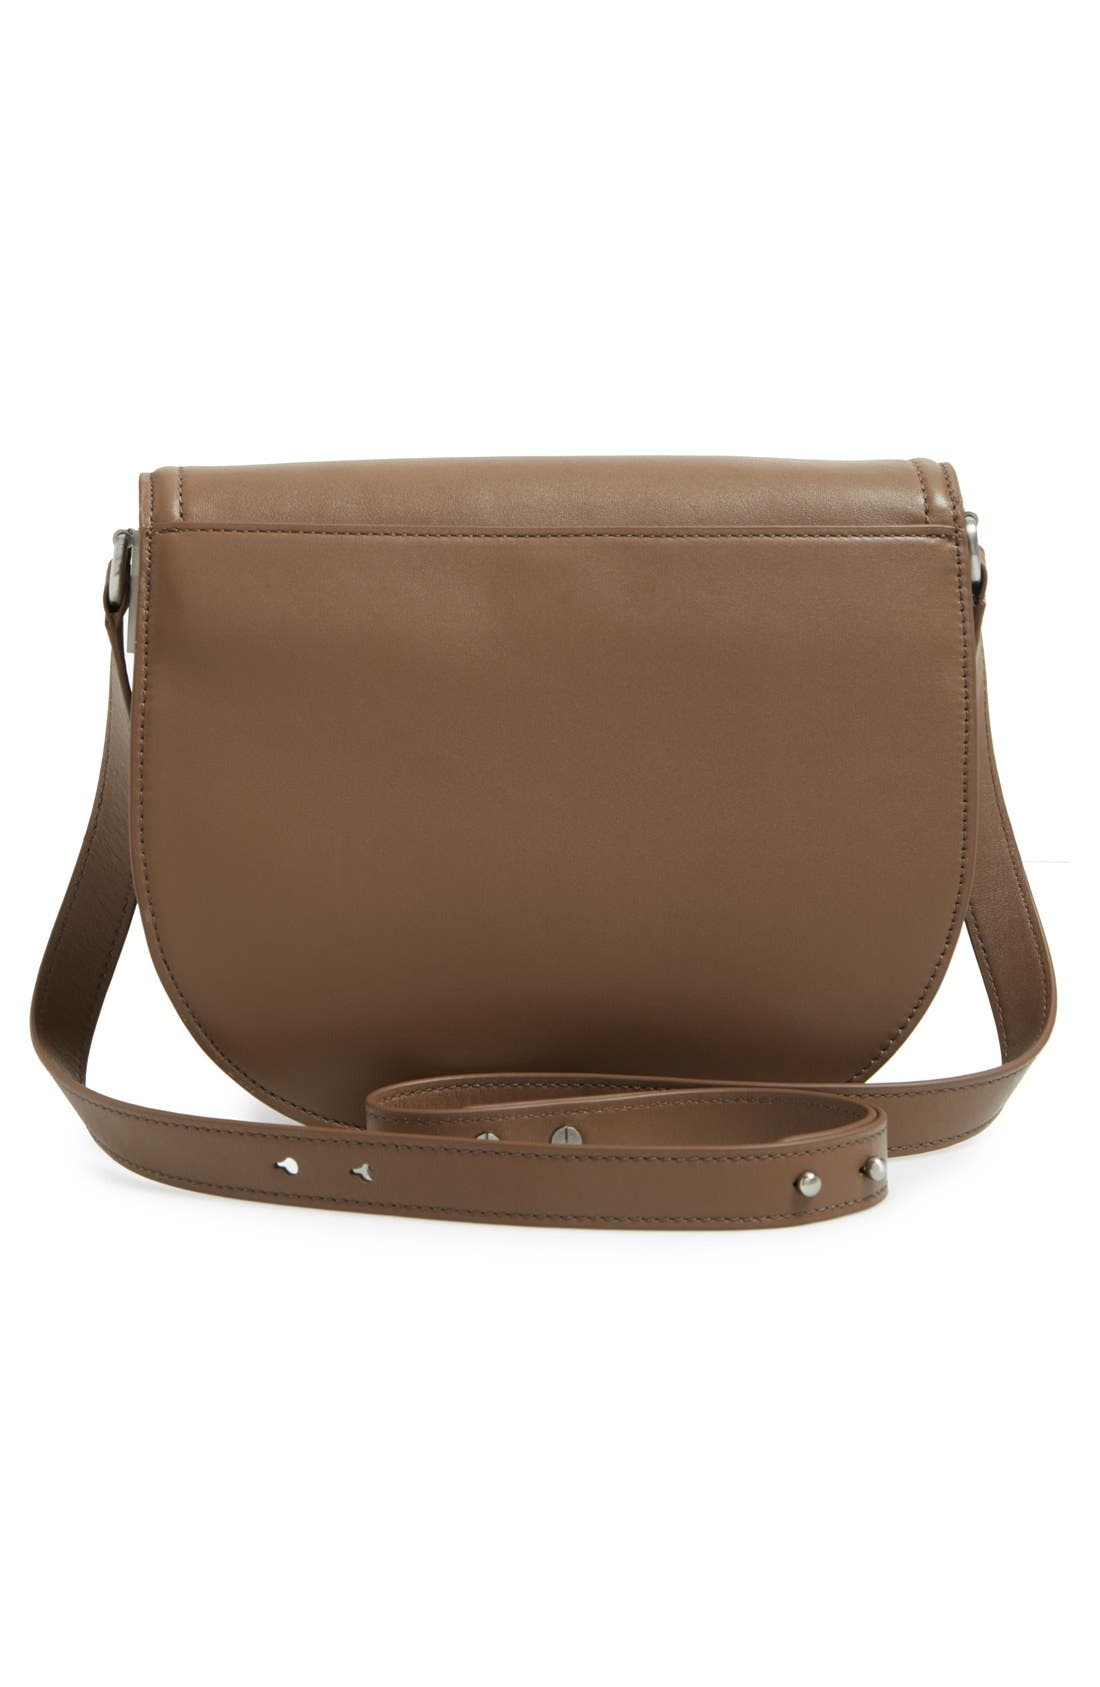 Alternate Image 3  - Loeffler Randall 'Large' Leather Saddle Bag